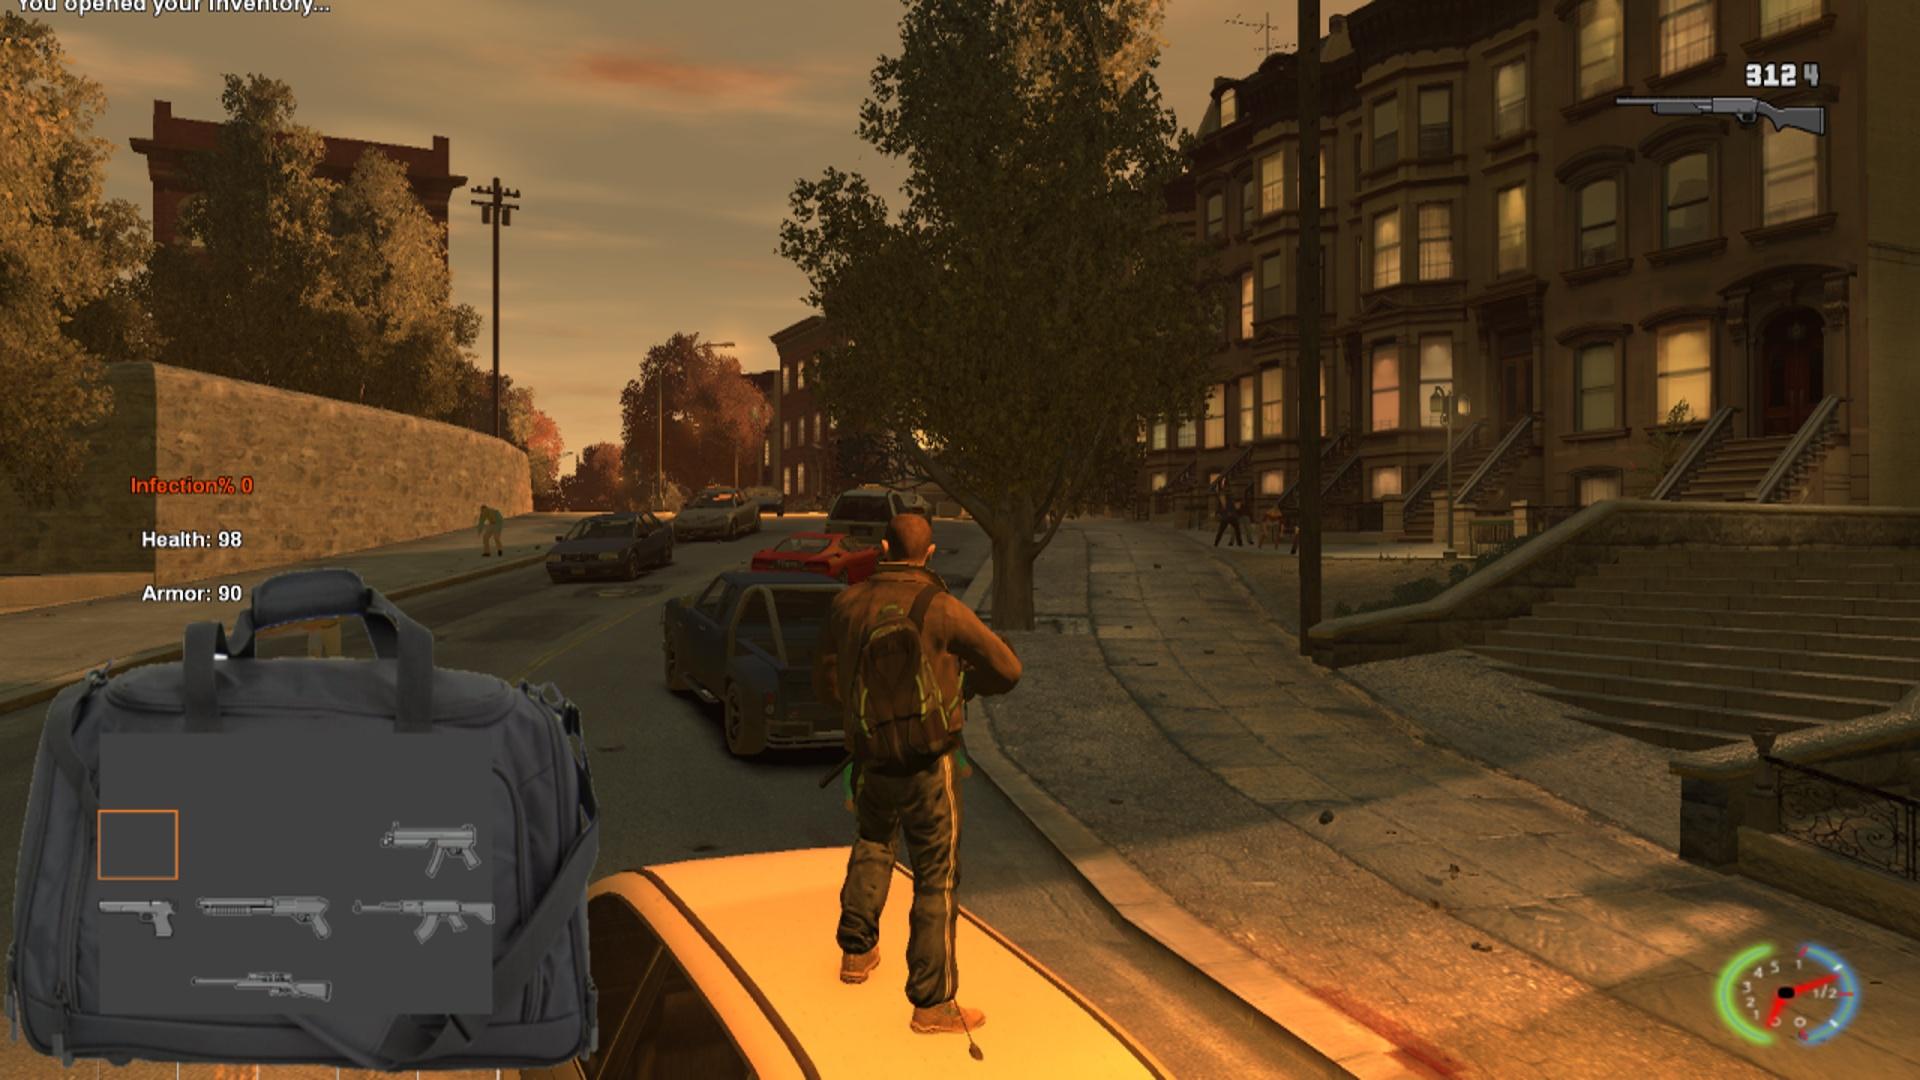 The GTA Place - Grand Theft Auto ZombieLand 1 0 / Zombie